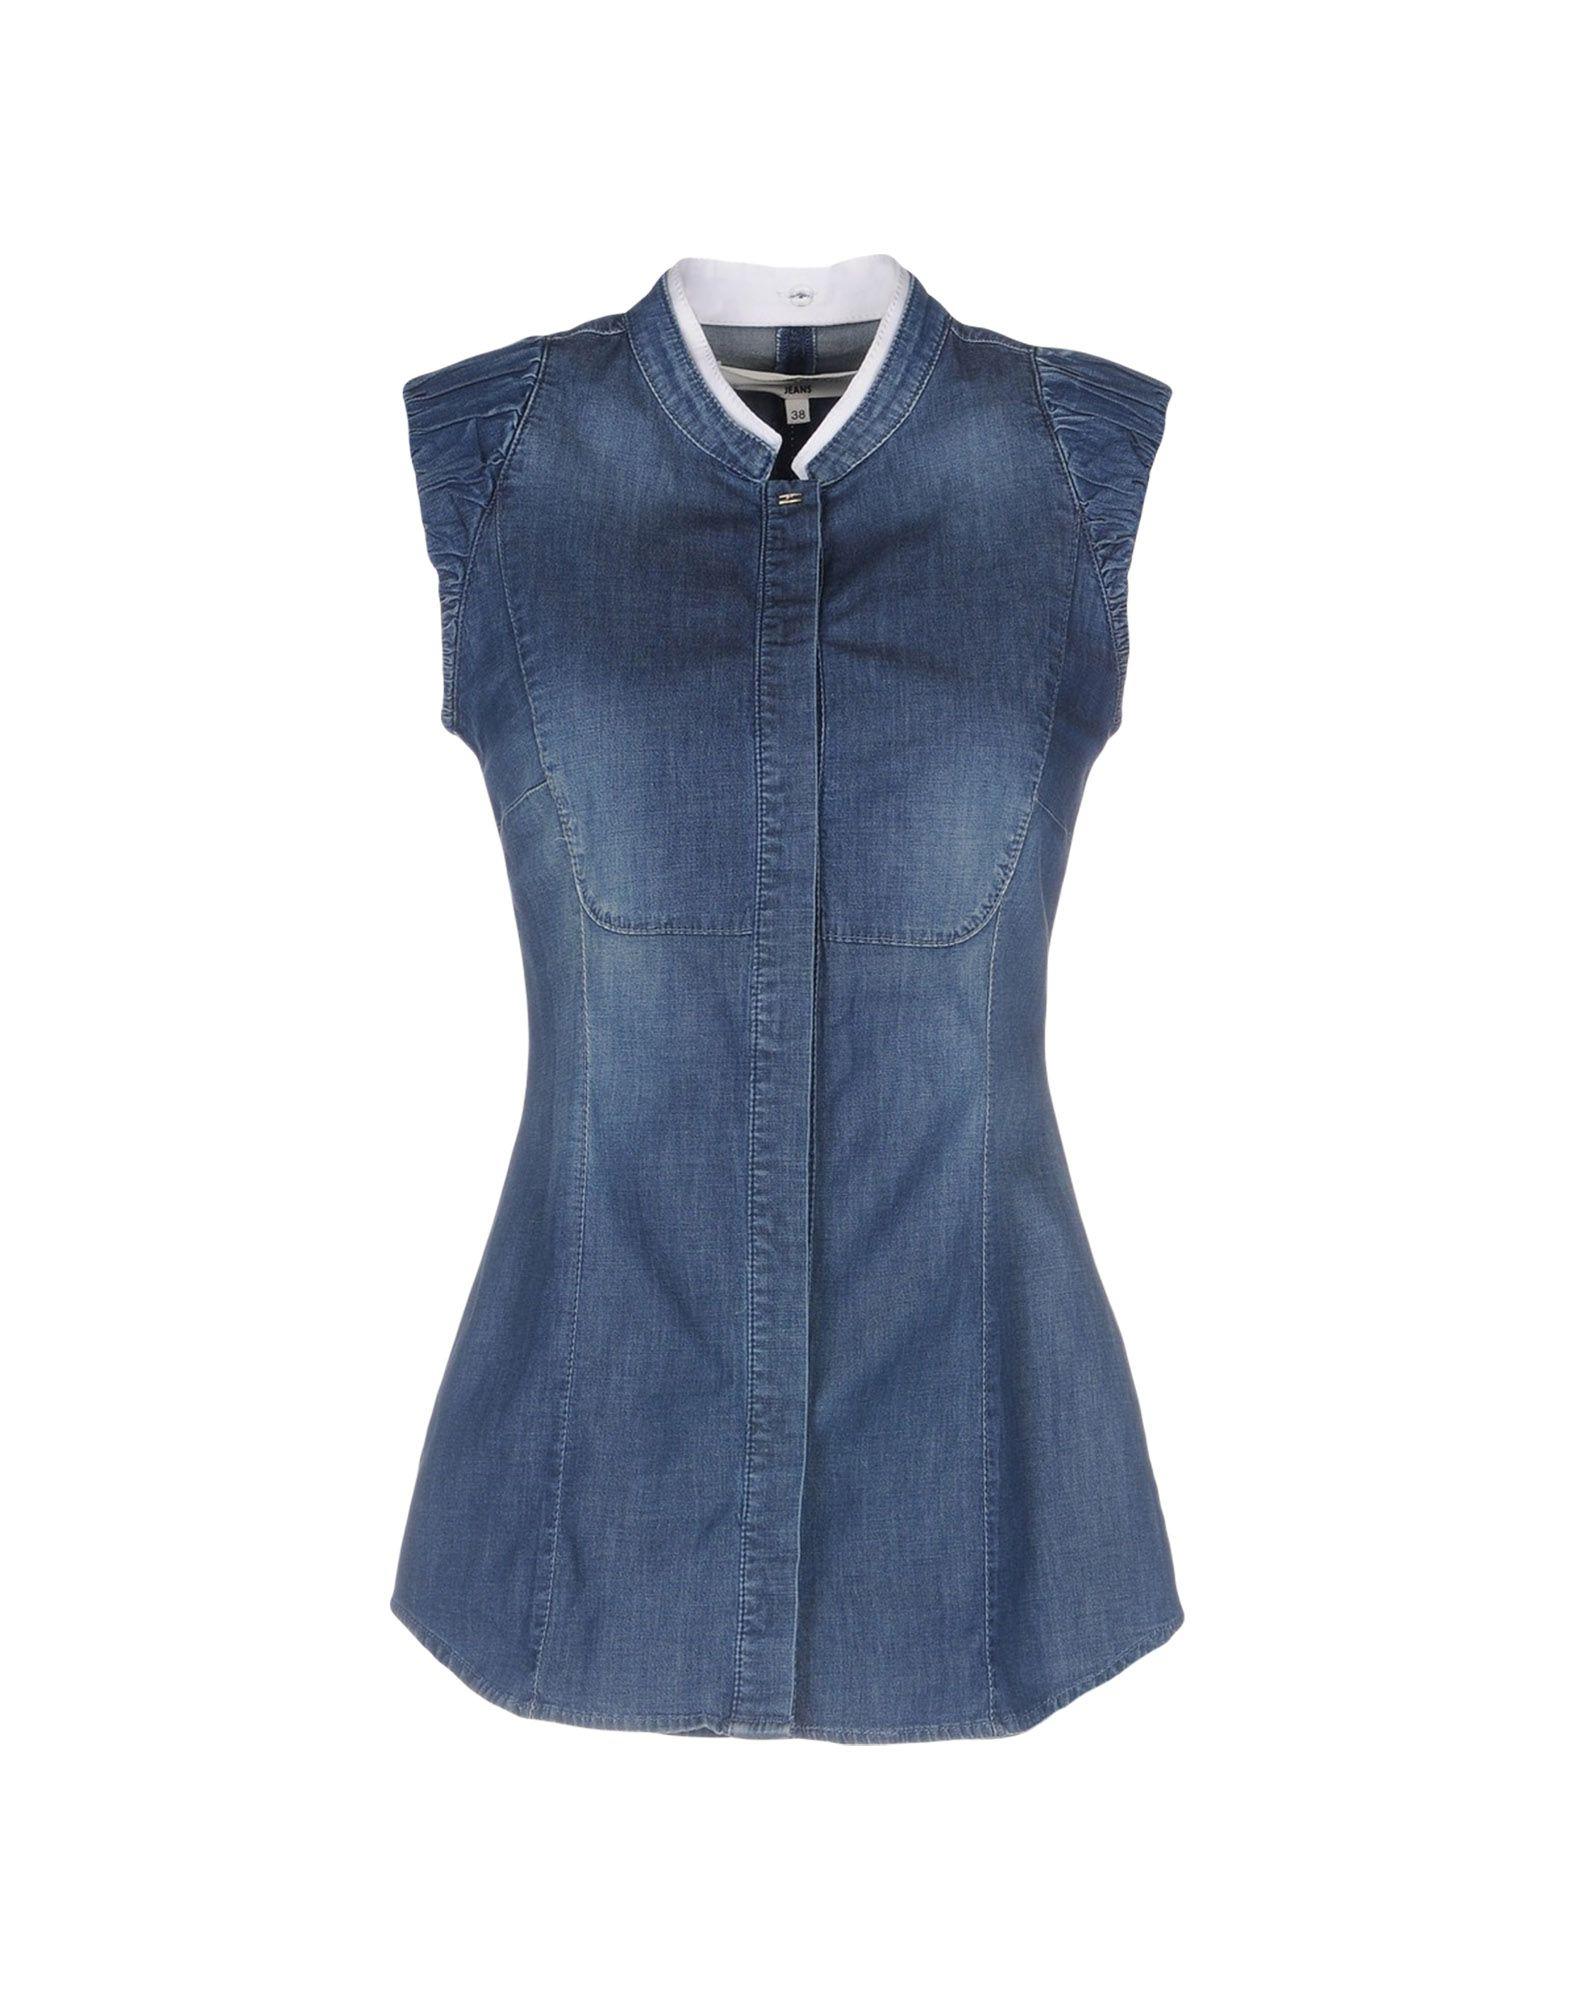 ELISABETTA FRANCHI JEANS Джинсовая рубашка elisabetta franchi рубашка от elisabetta franchi 55248